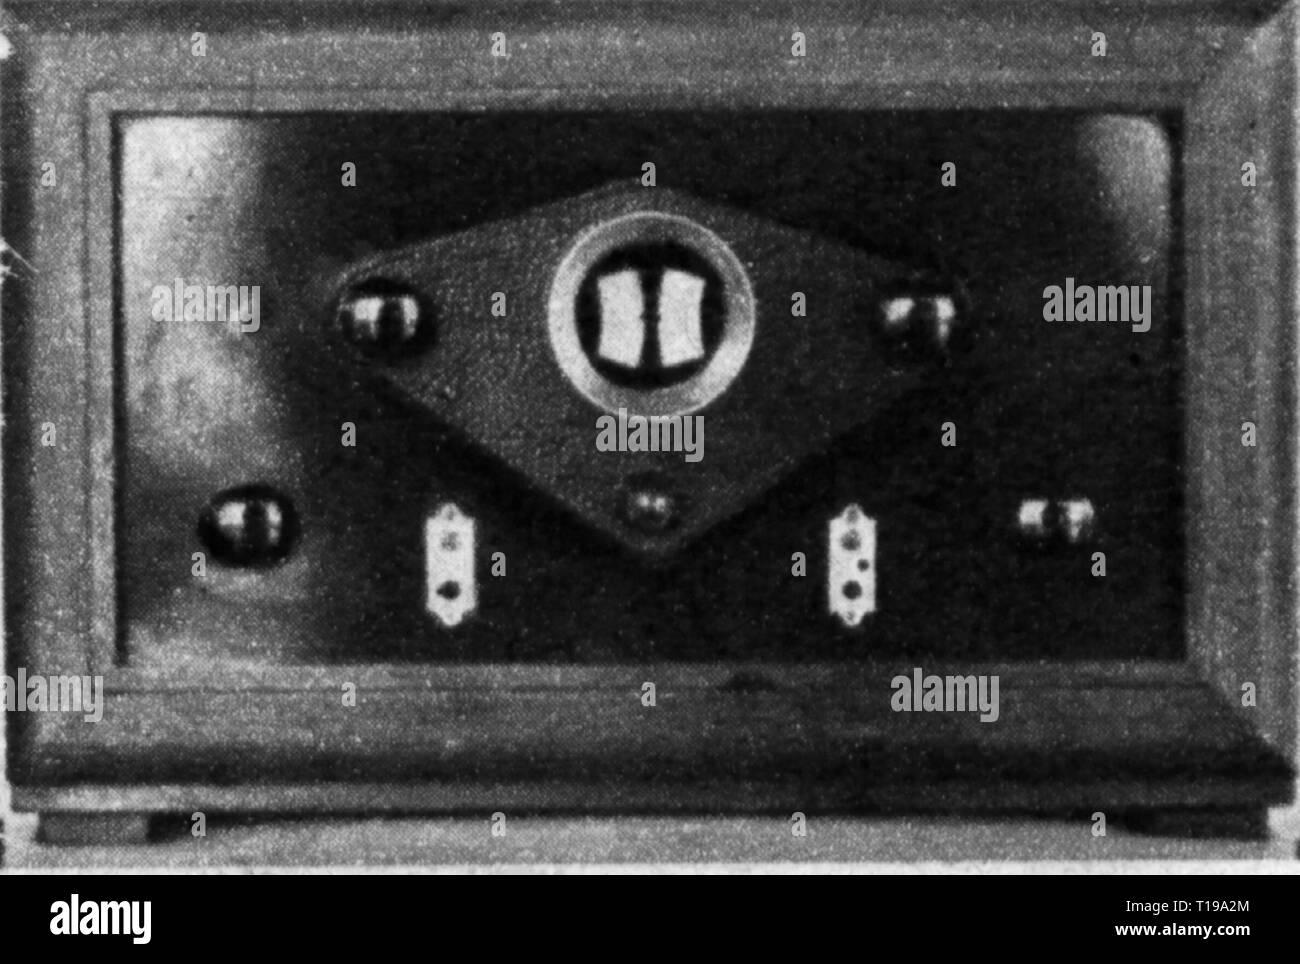 Rundfunk, Radio, Radios, Lenkung Funkempfänger, Deutschland, 1928, Additional-Rights - Clearance-Info - Not-Available Stockbild